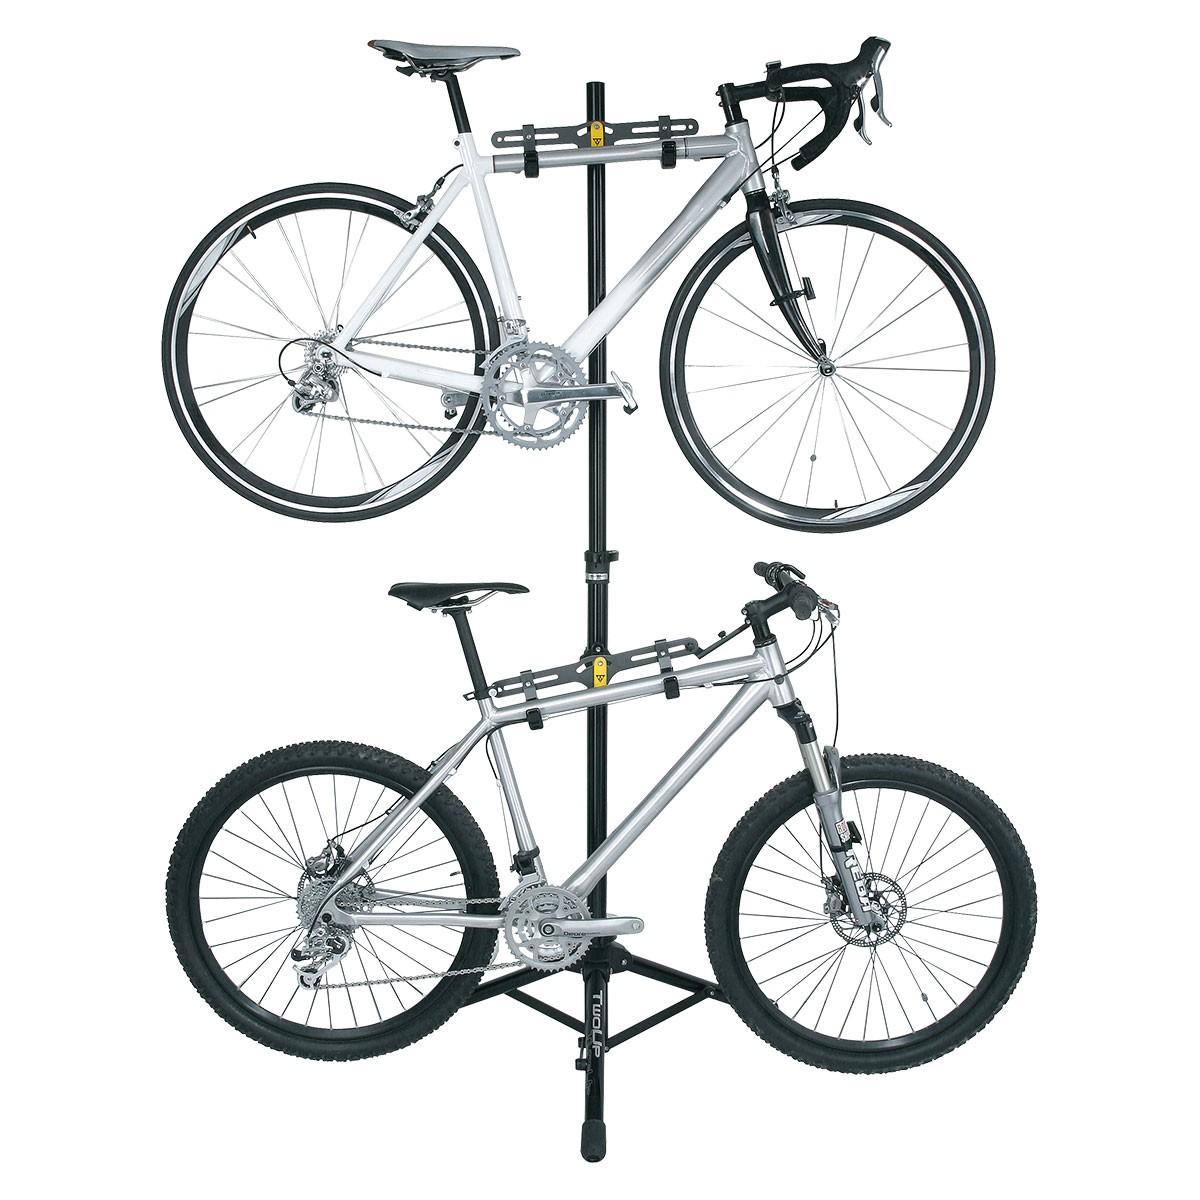 Best bike storage solutions 2018: hooks, racks and sheds